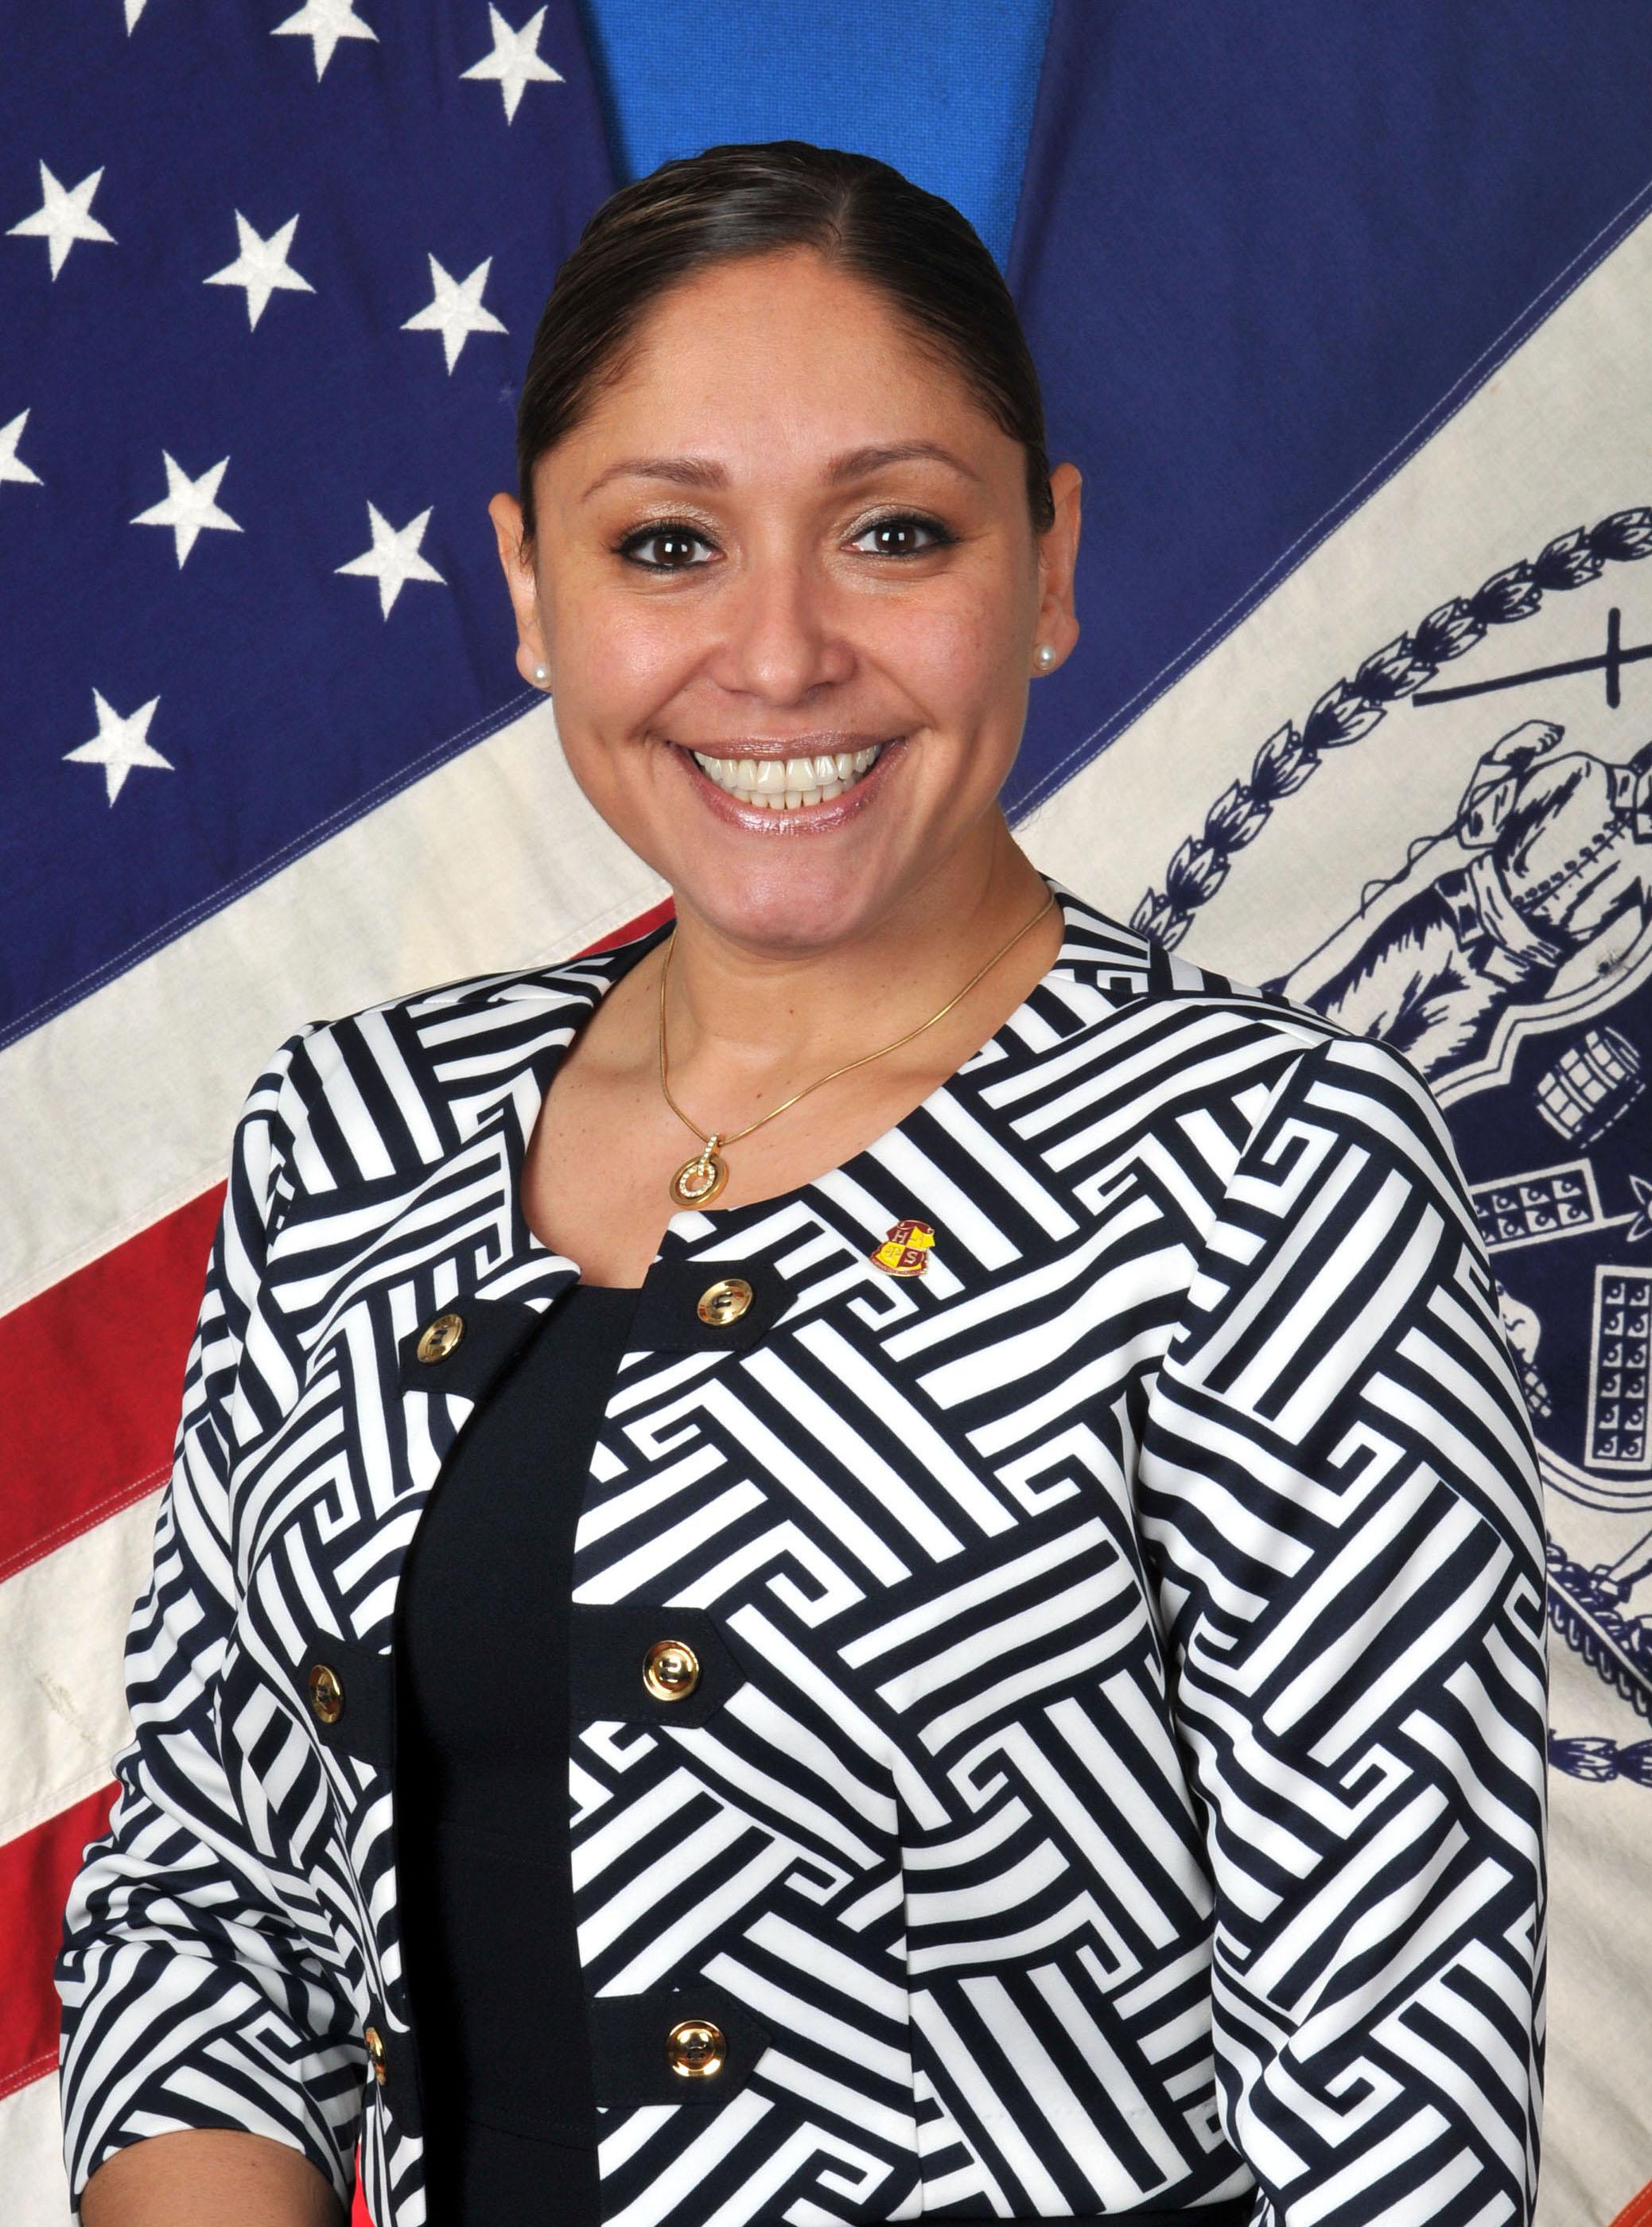 Jenni Marie Cruz